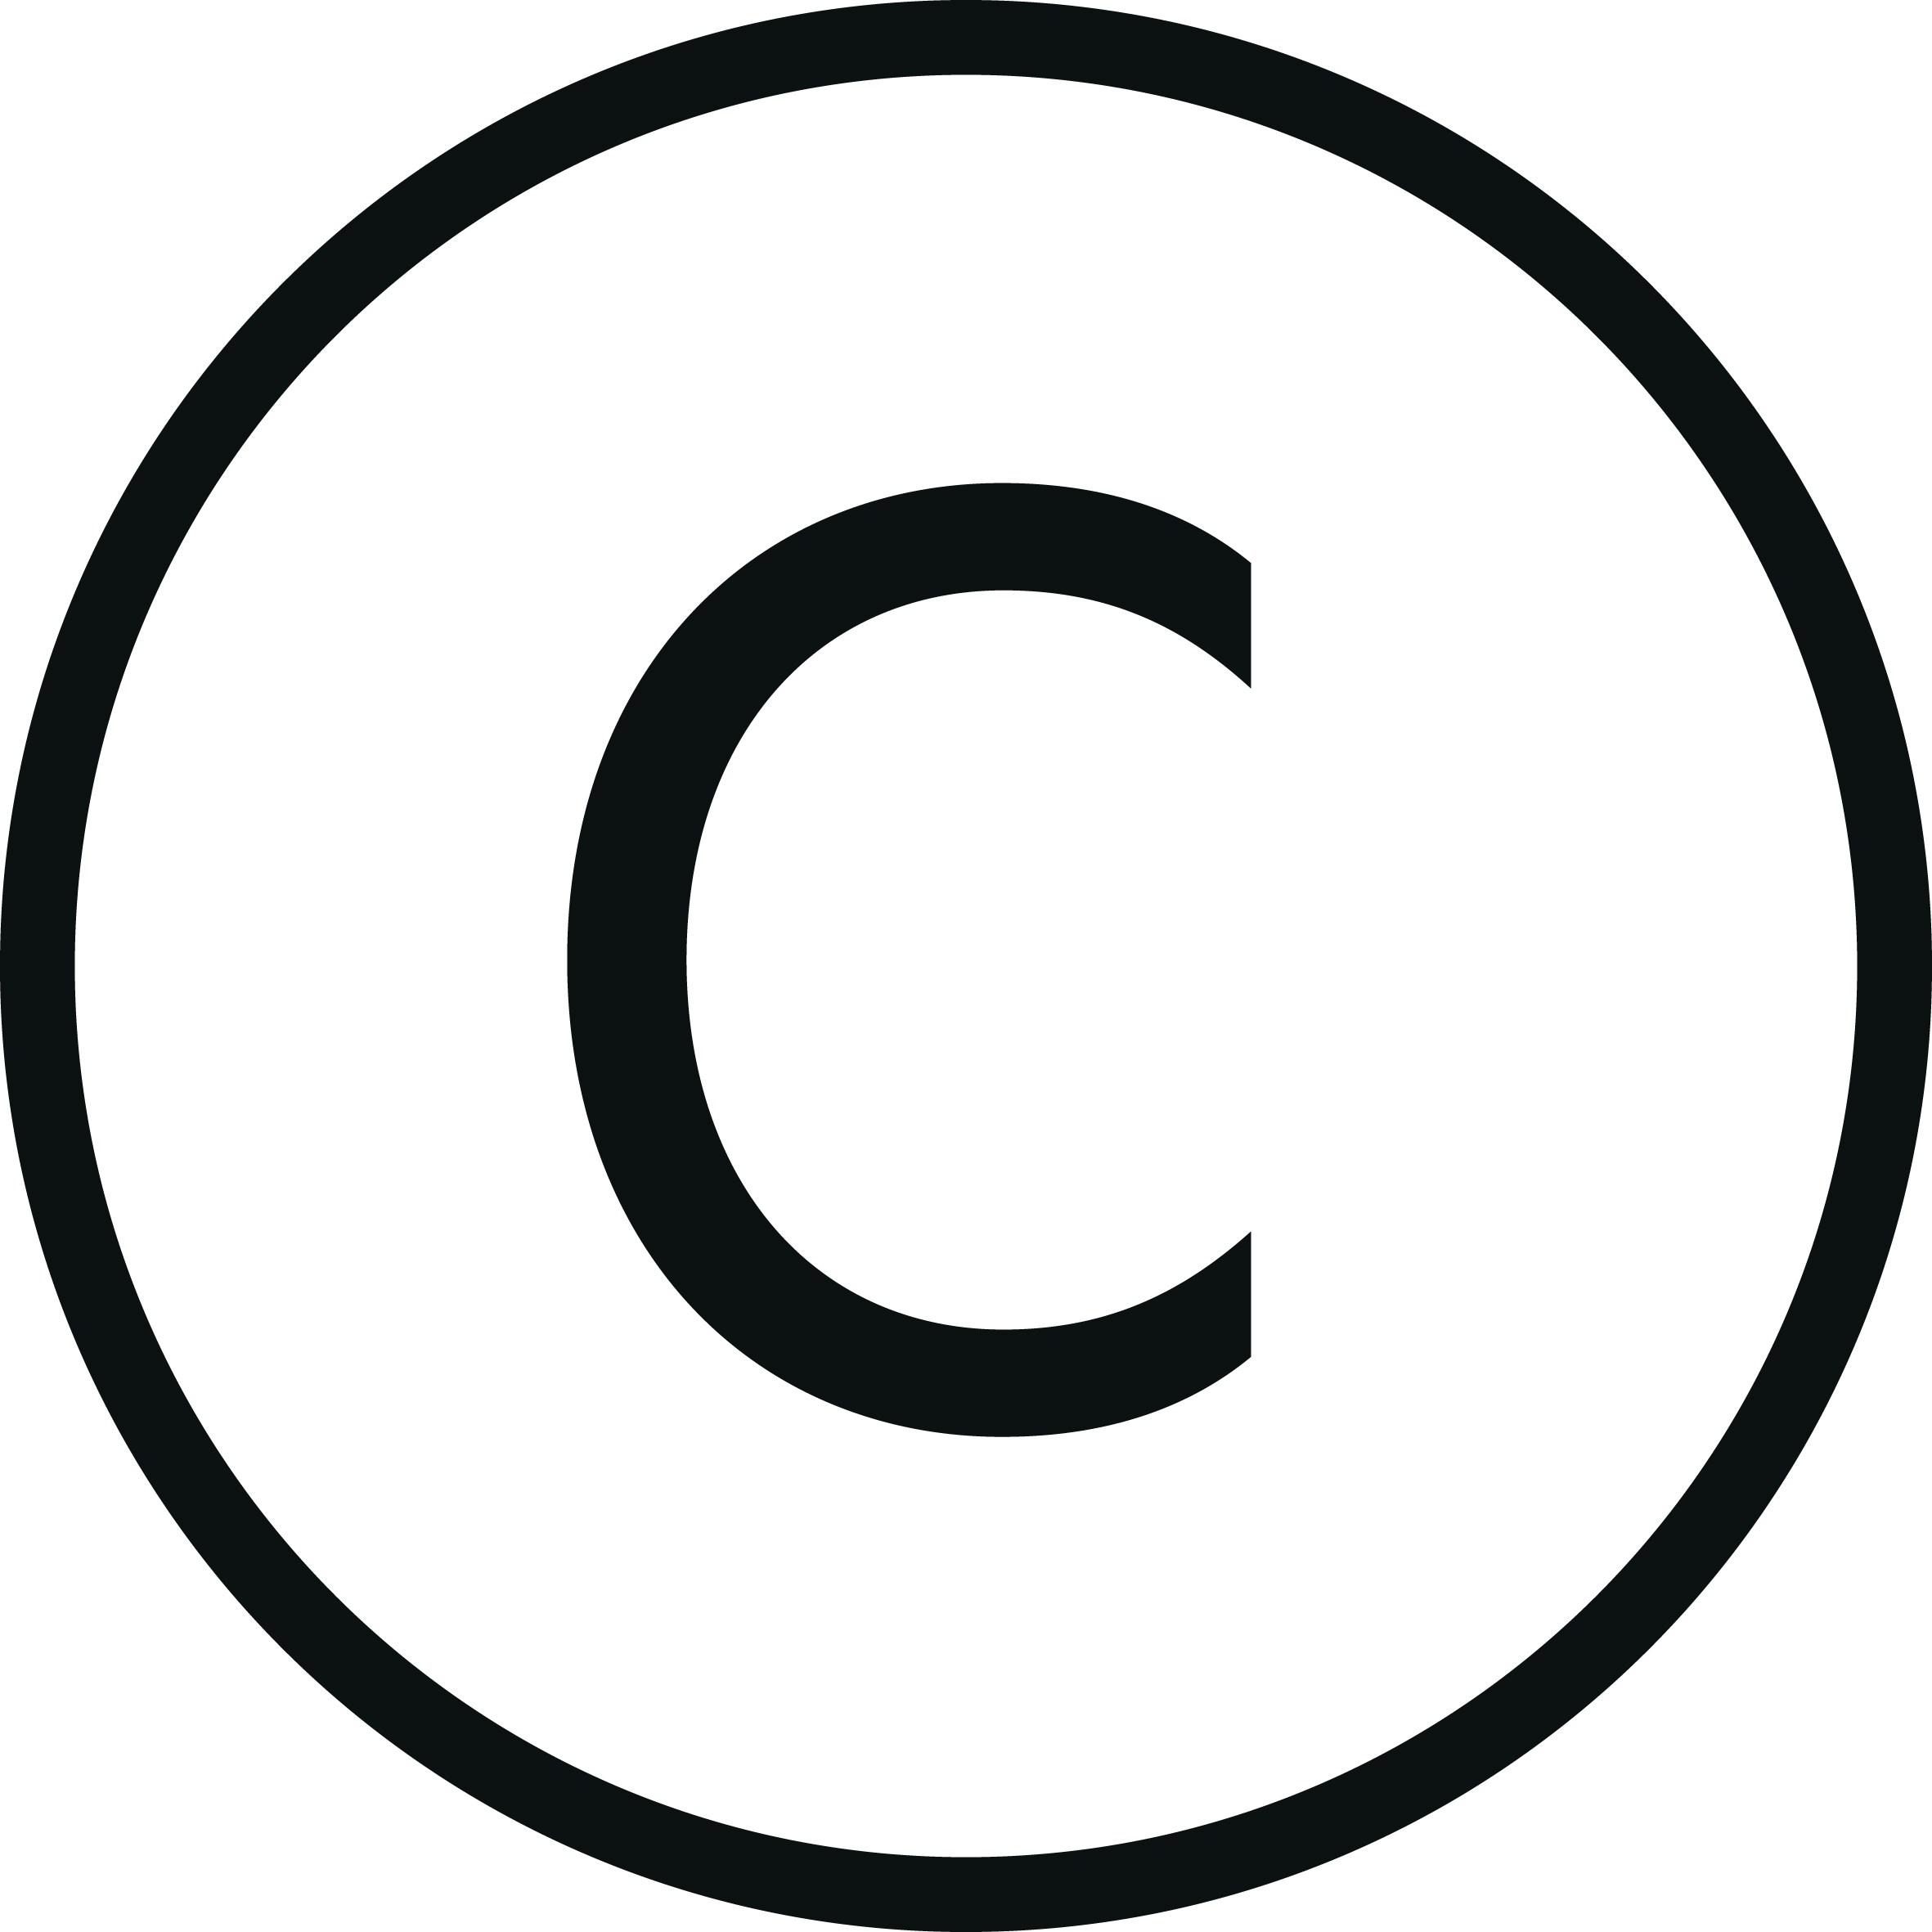 Energy_Label_C-PSAAAP16PC569136.jpg